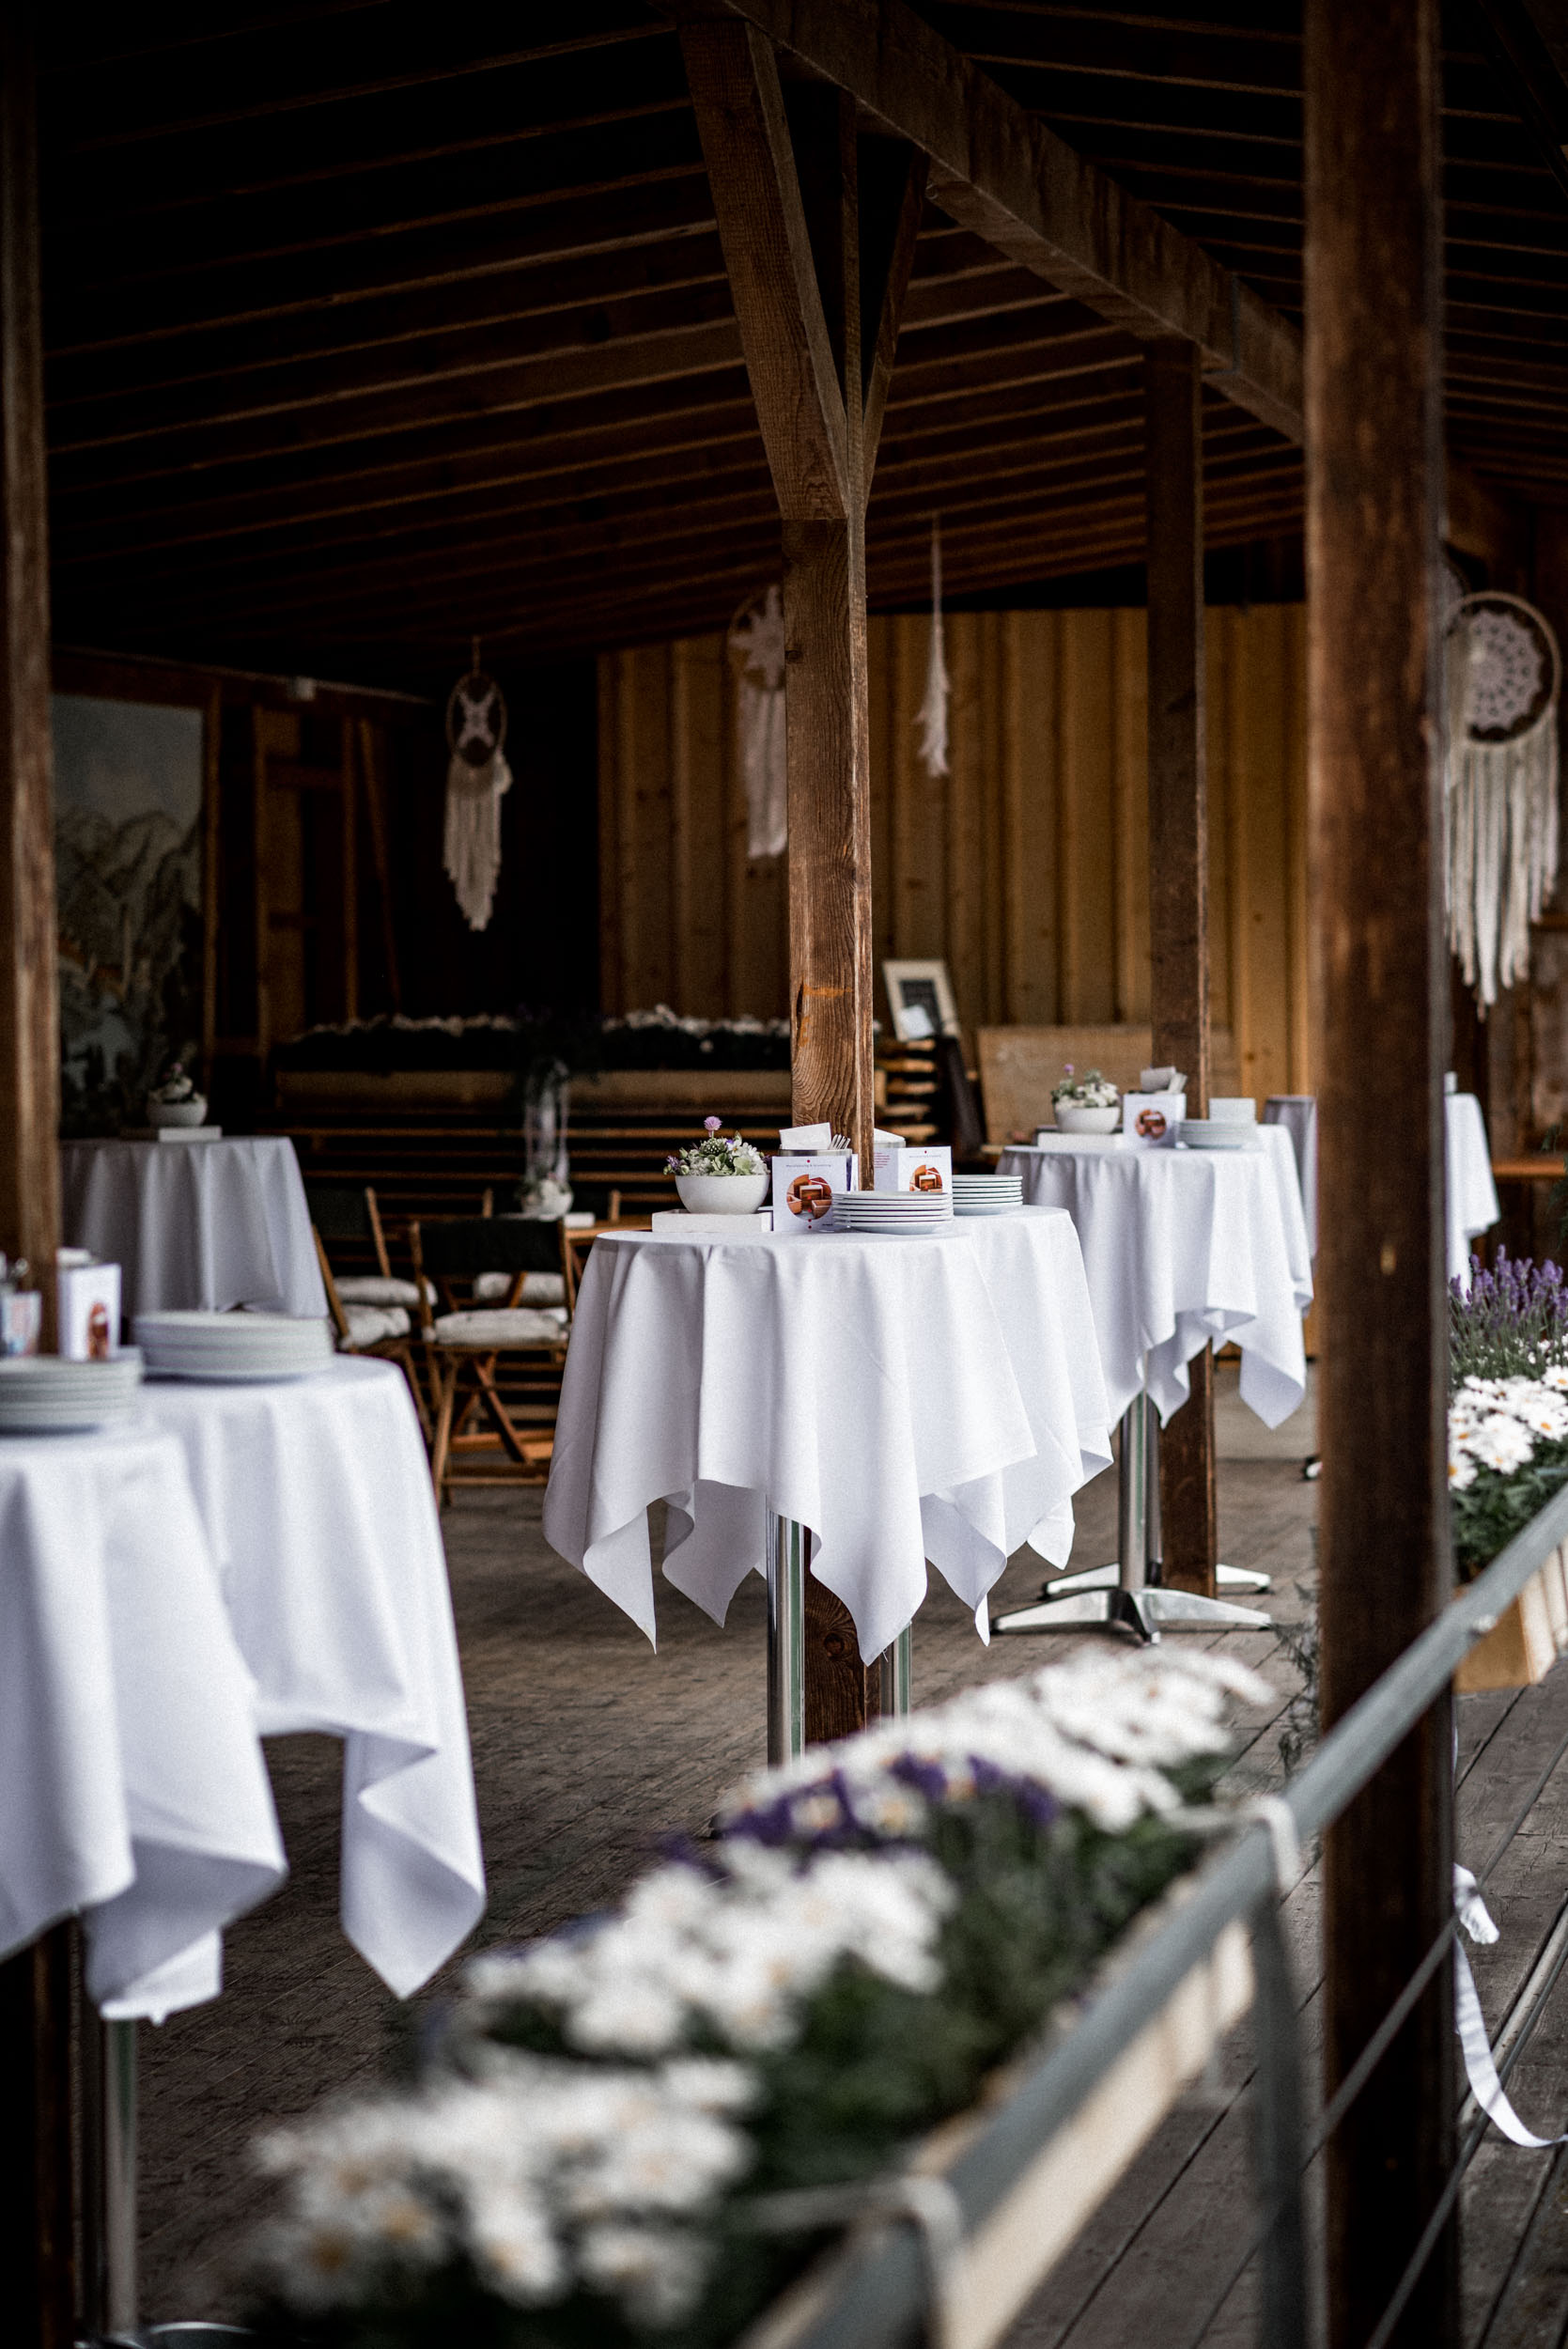 Hochzeitsreportage-Baden-Aargau_2019_19.jpg